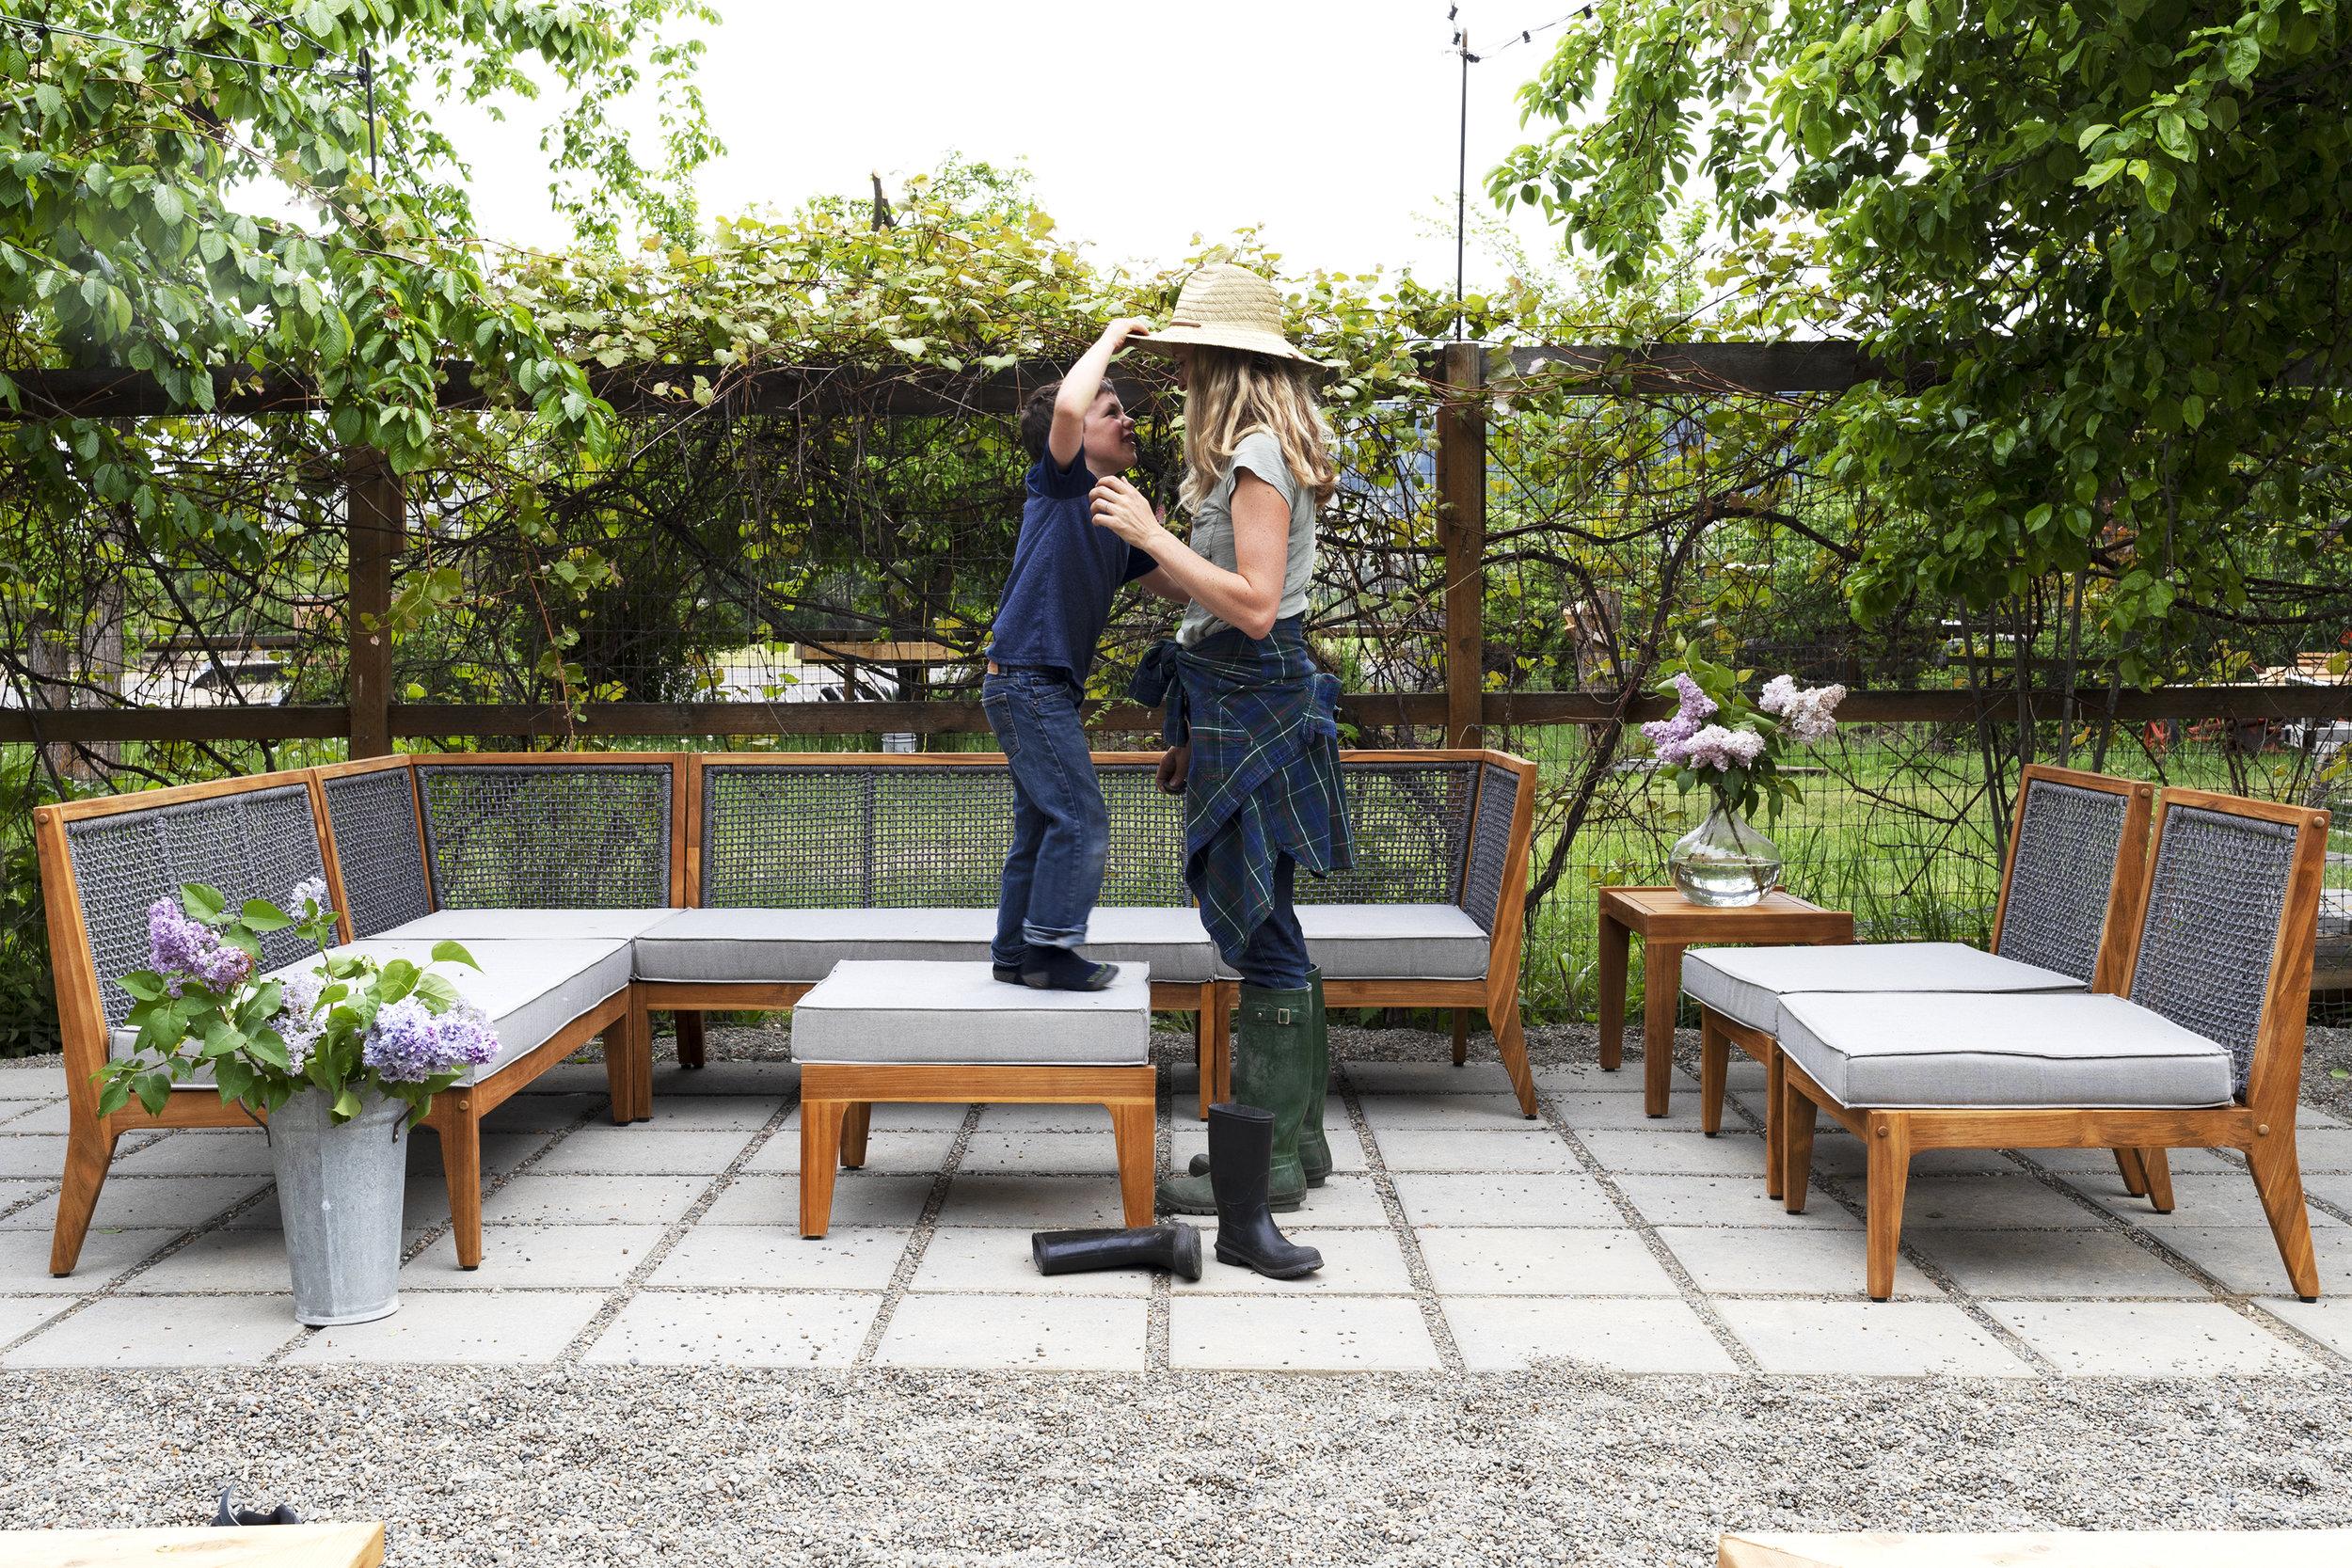 The Grit and Polish - Farmhouse Garden Patio Furniture Me + W 2.jpg